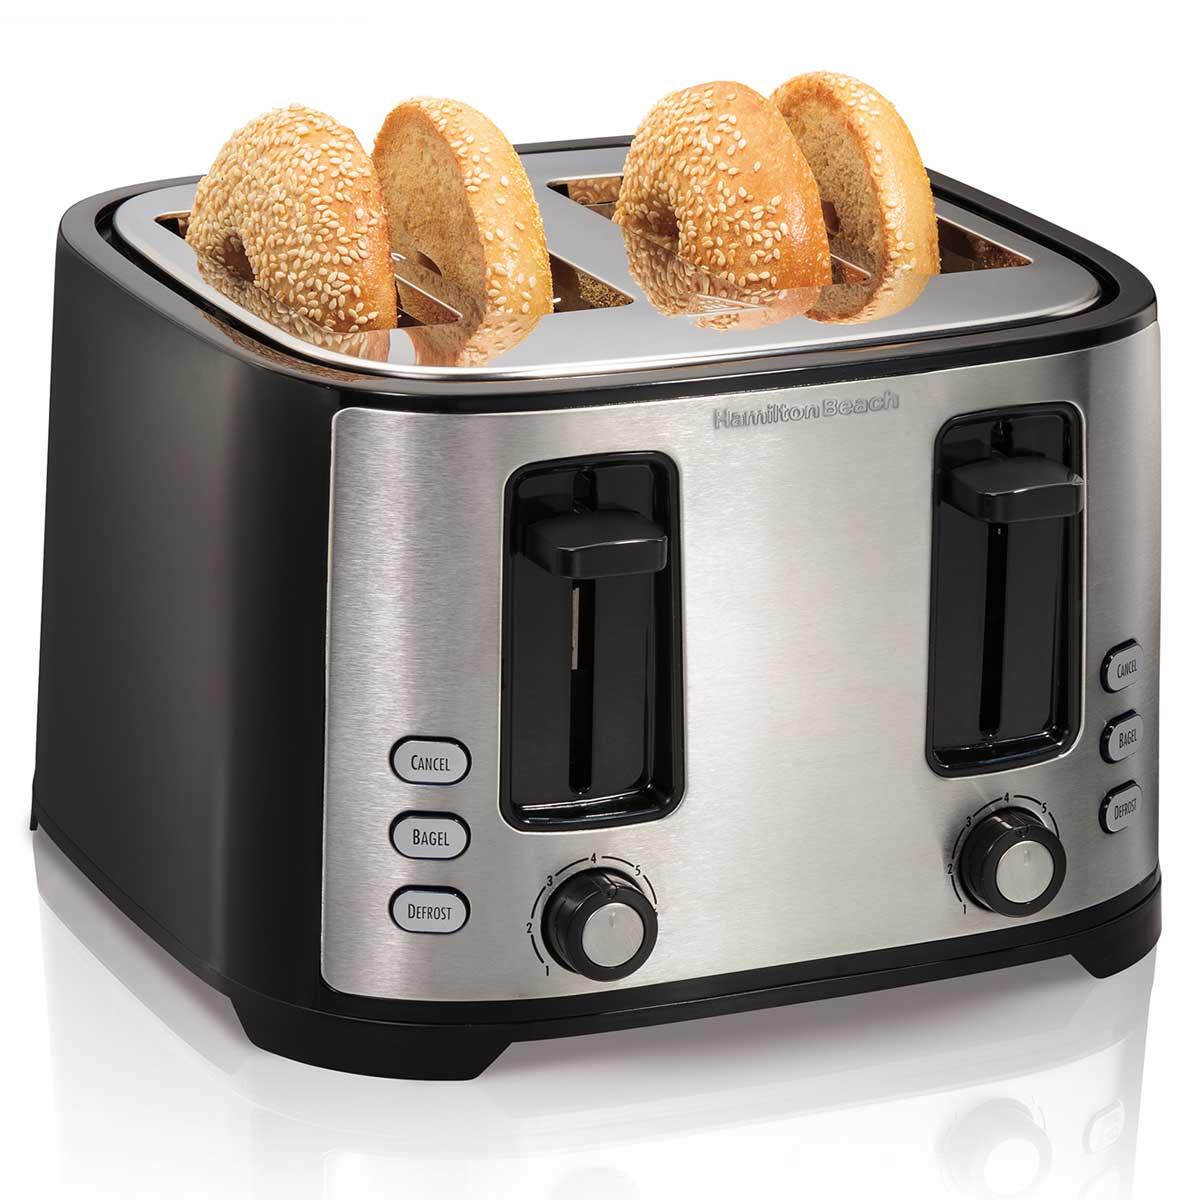 Roasters Toasters: Hamilton Beach Extra-Wide Slot 4-Slice Toaster